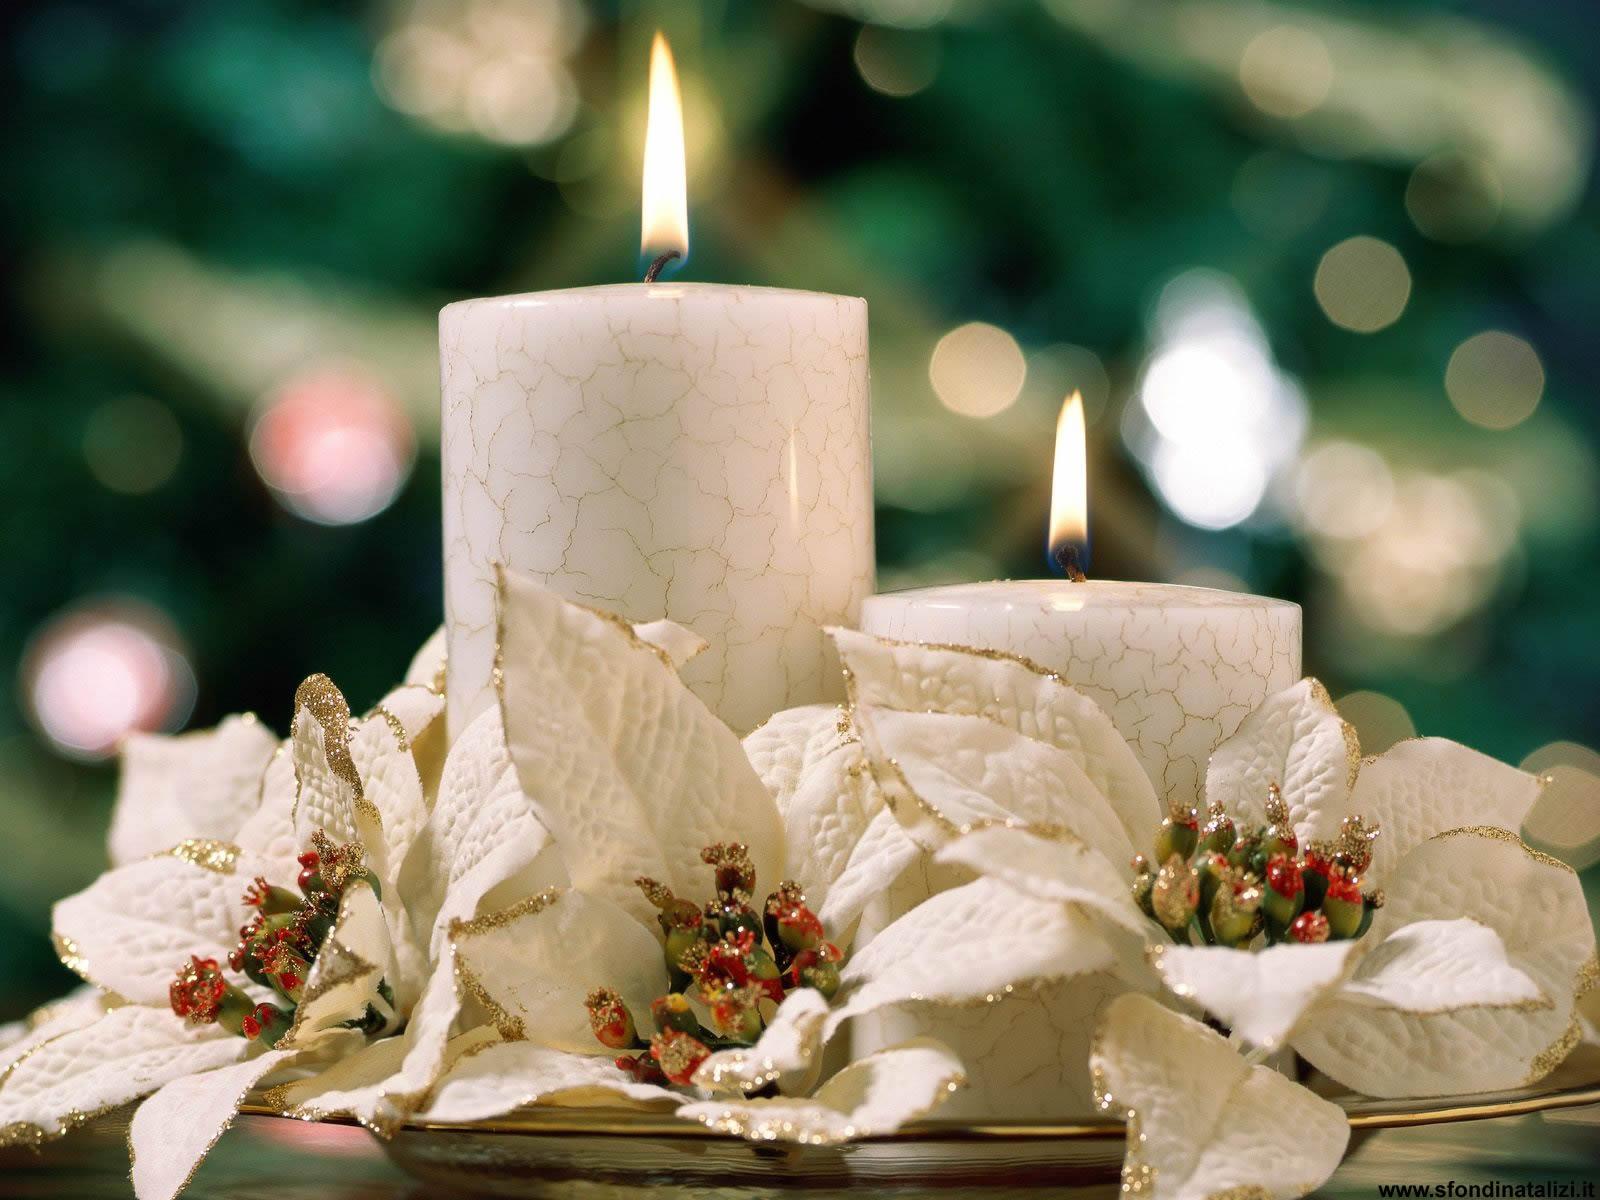 Sfondo Natalizio - Candela natalizia